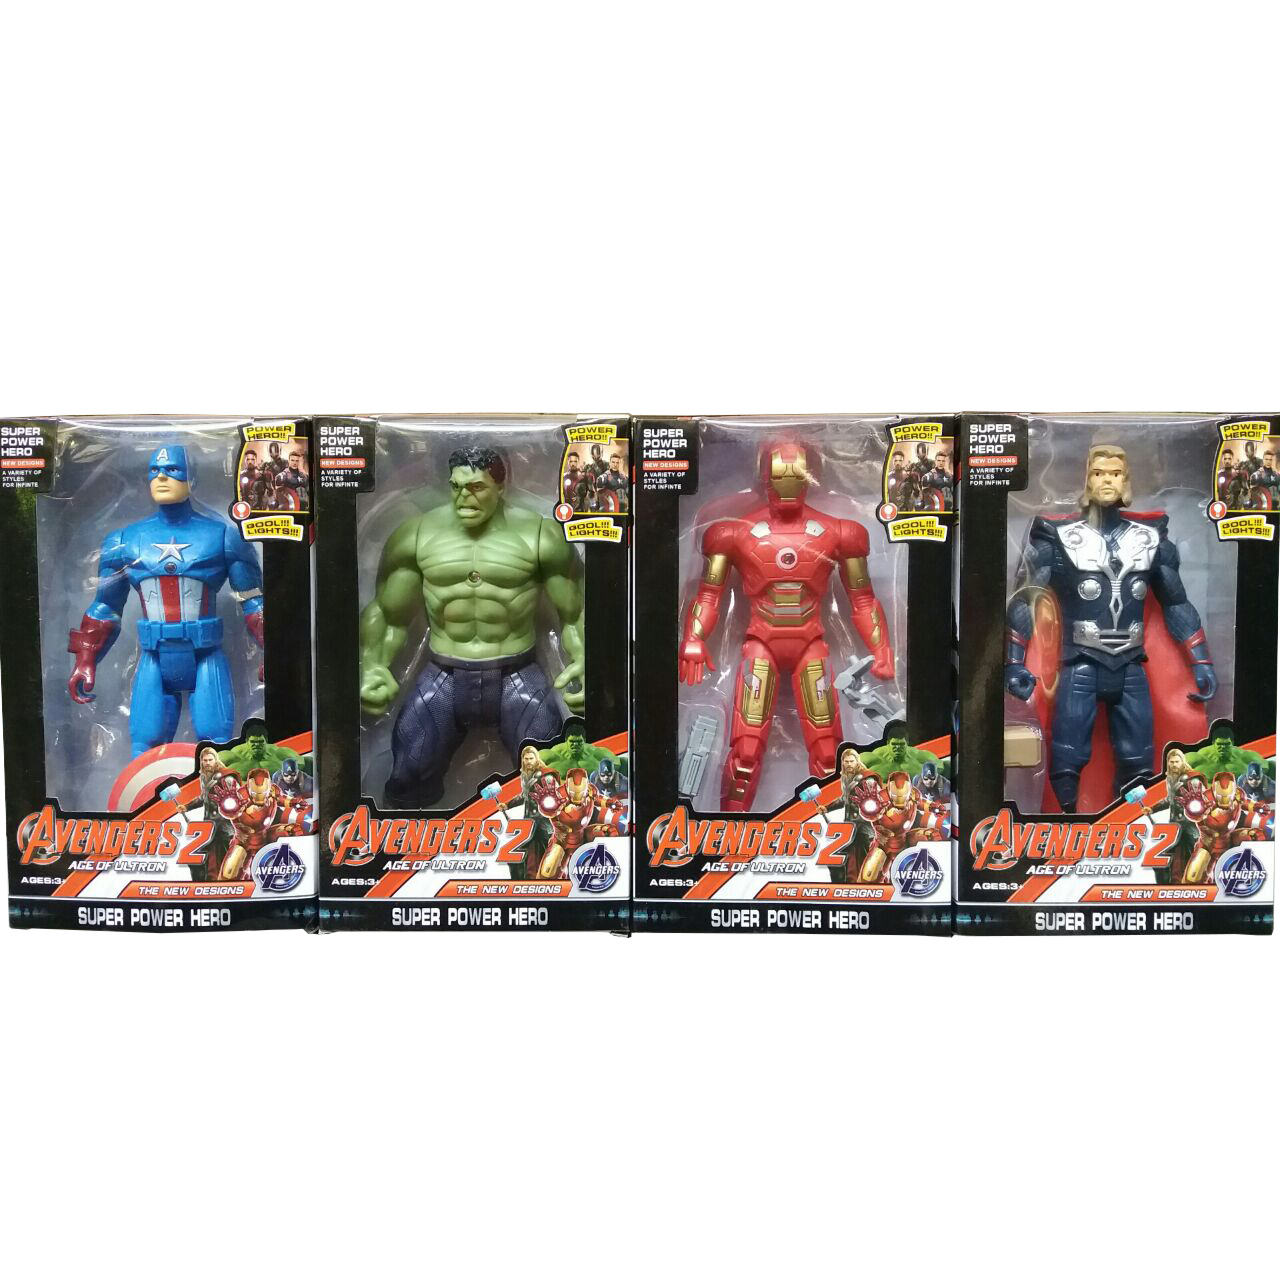 Robot Avengers Small Susanna Baby Kids 1 Set Isi 4 Karakter Captain America Ironman Thor Hulk Dada Bisa Nyala Tinggi 19cm Tiap Box 21x13x55cm